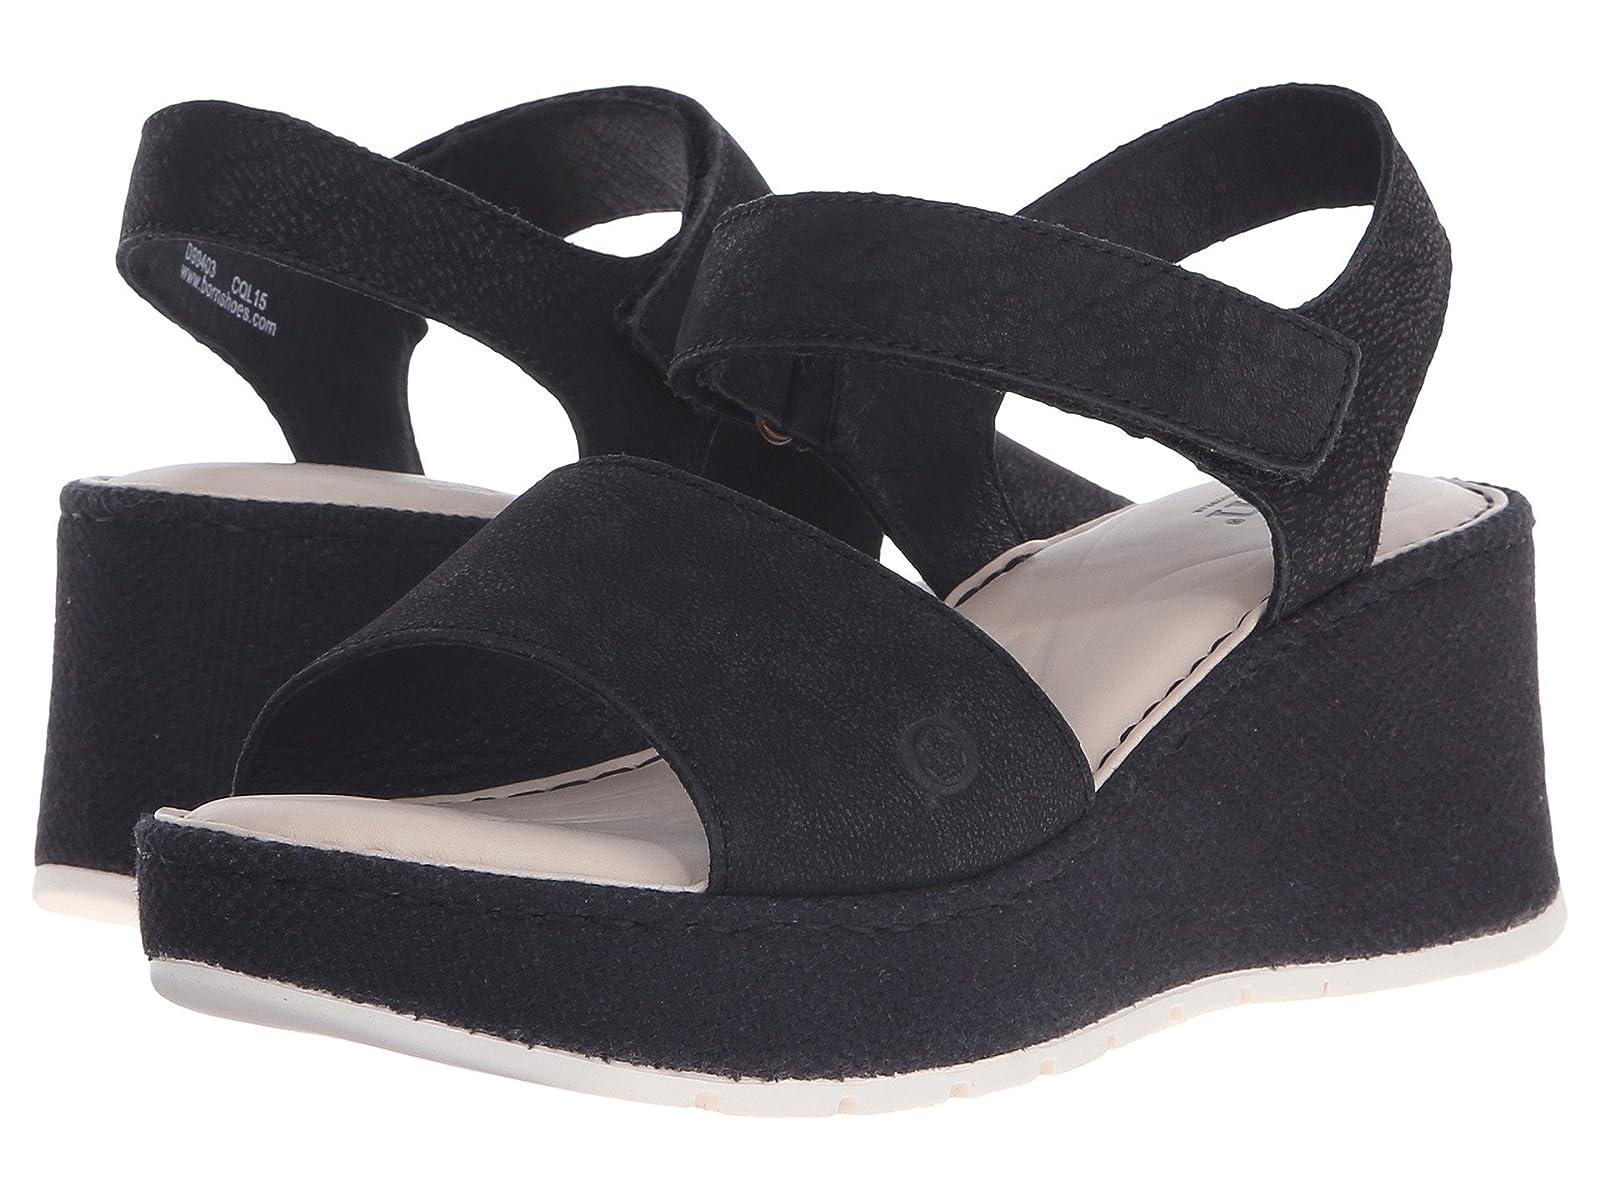 Born LuceeCheap and distinctive eye-catching shoes